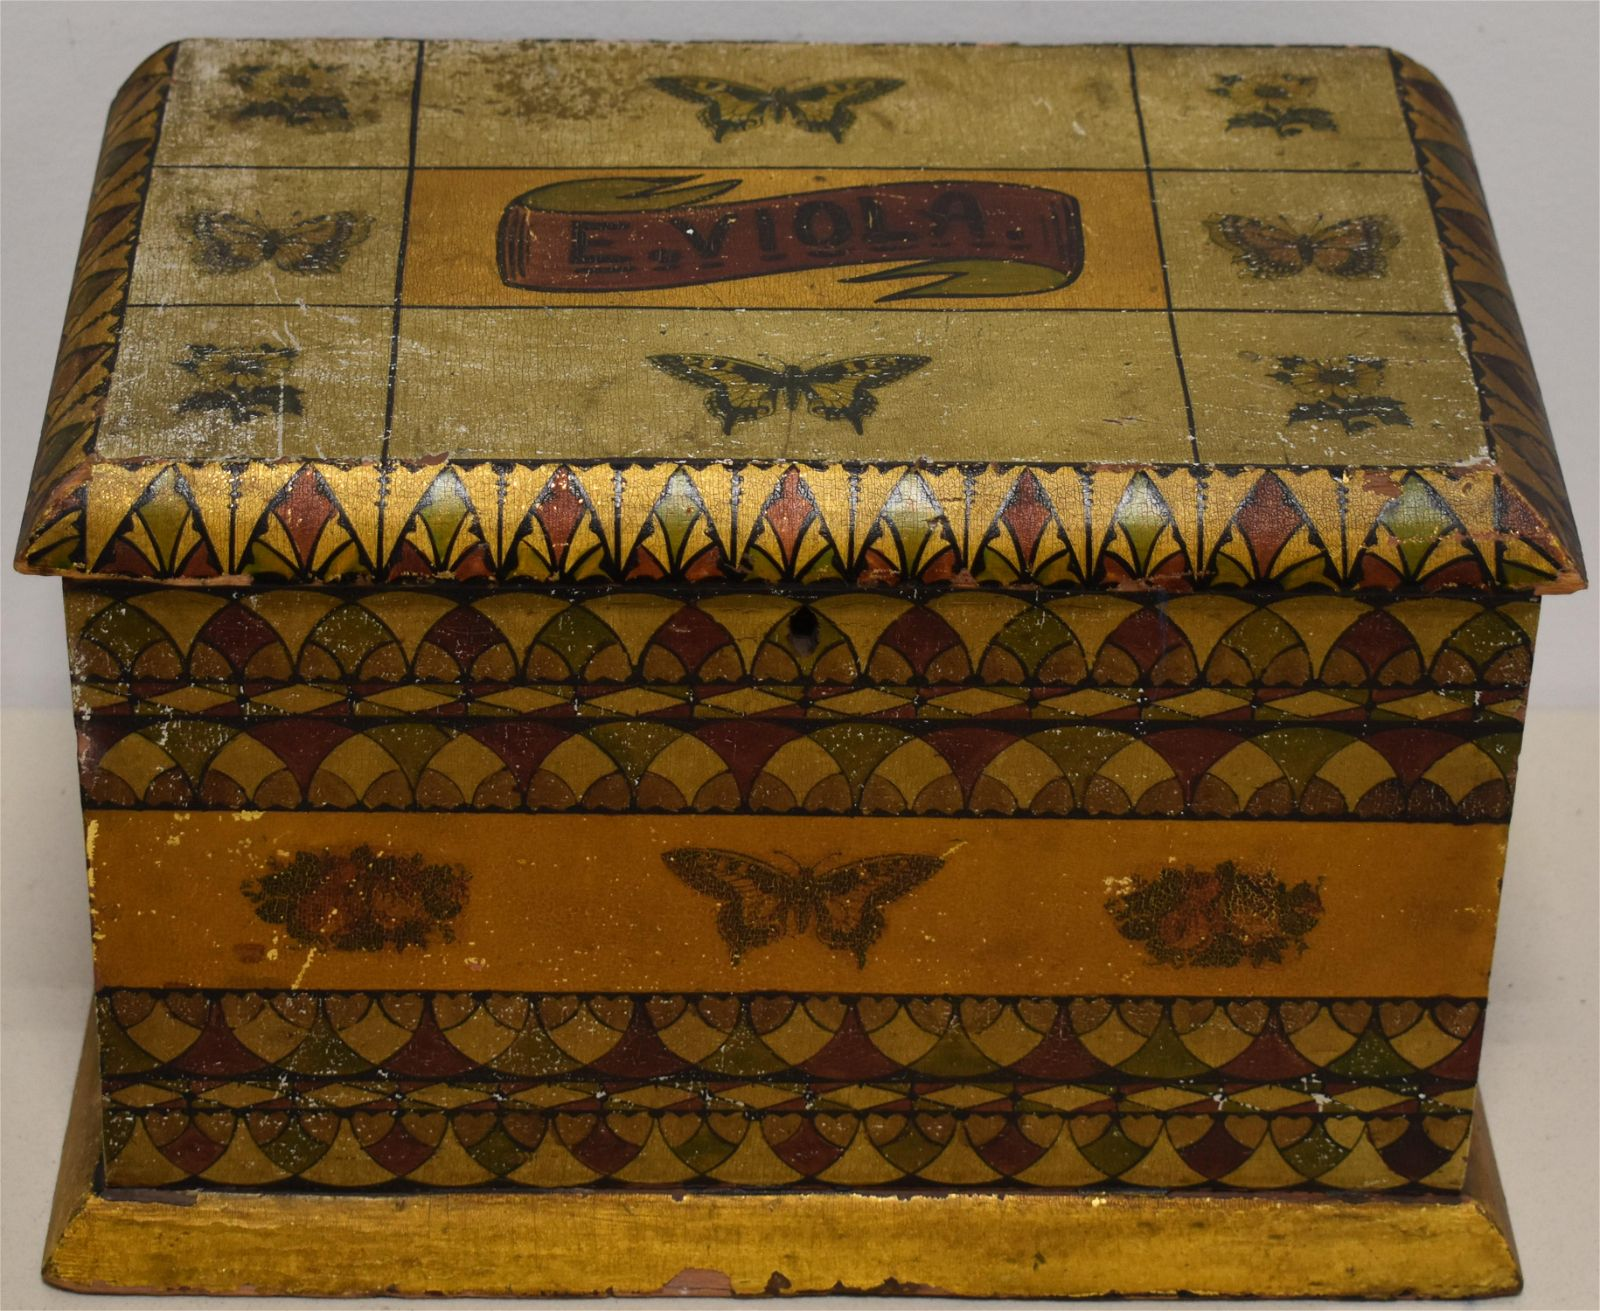 19th Century Paint Decorated Document Box